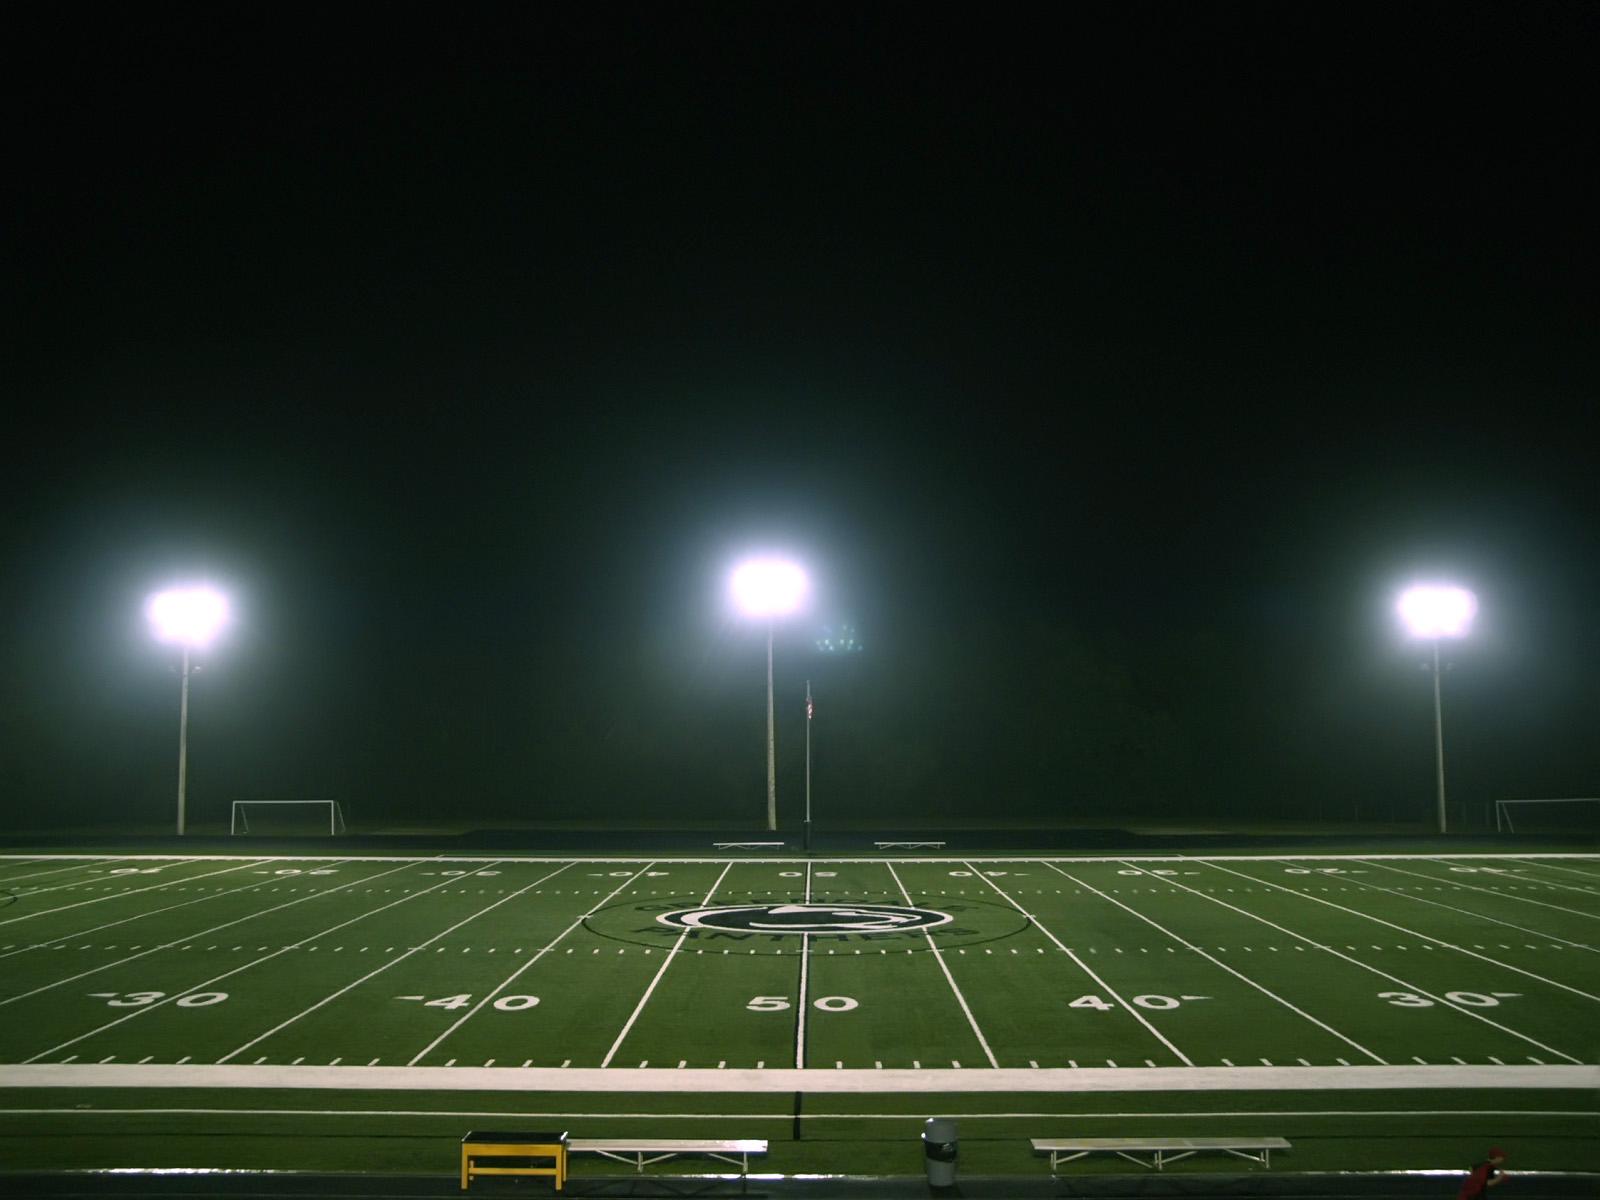 3D NFL Football...